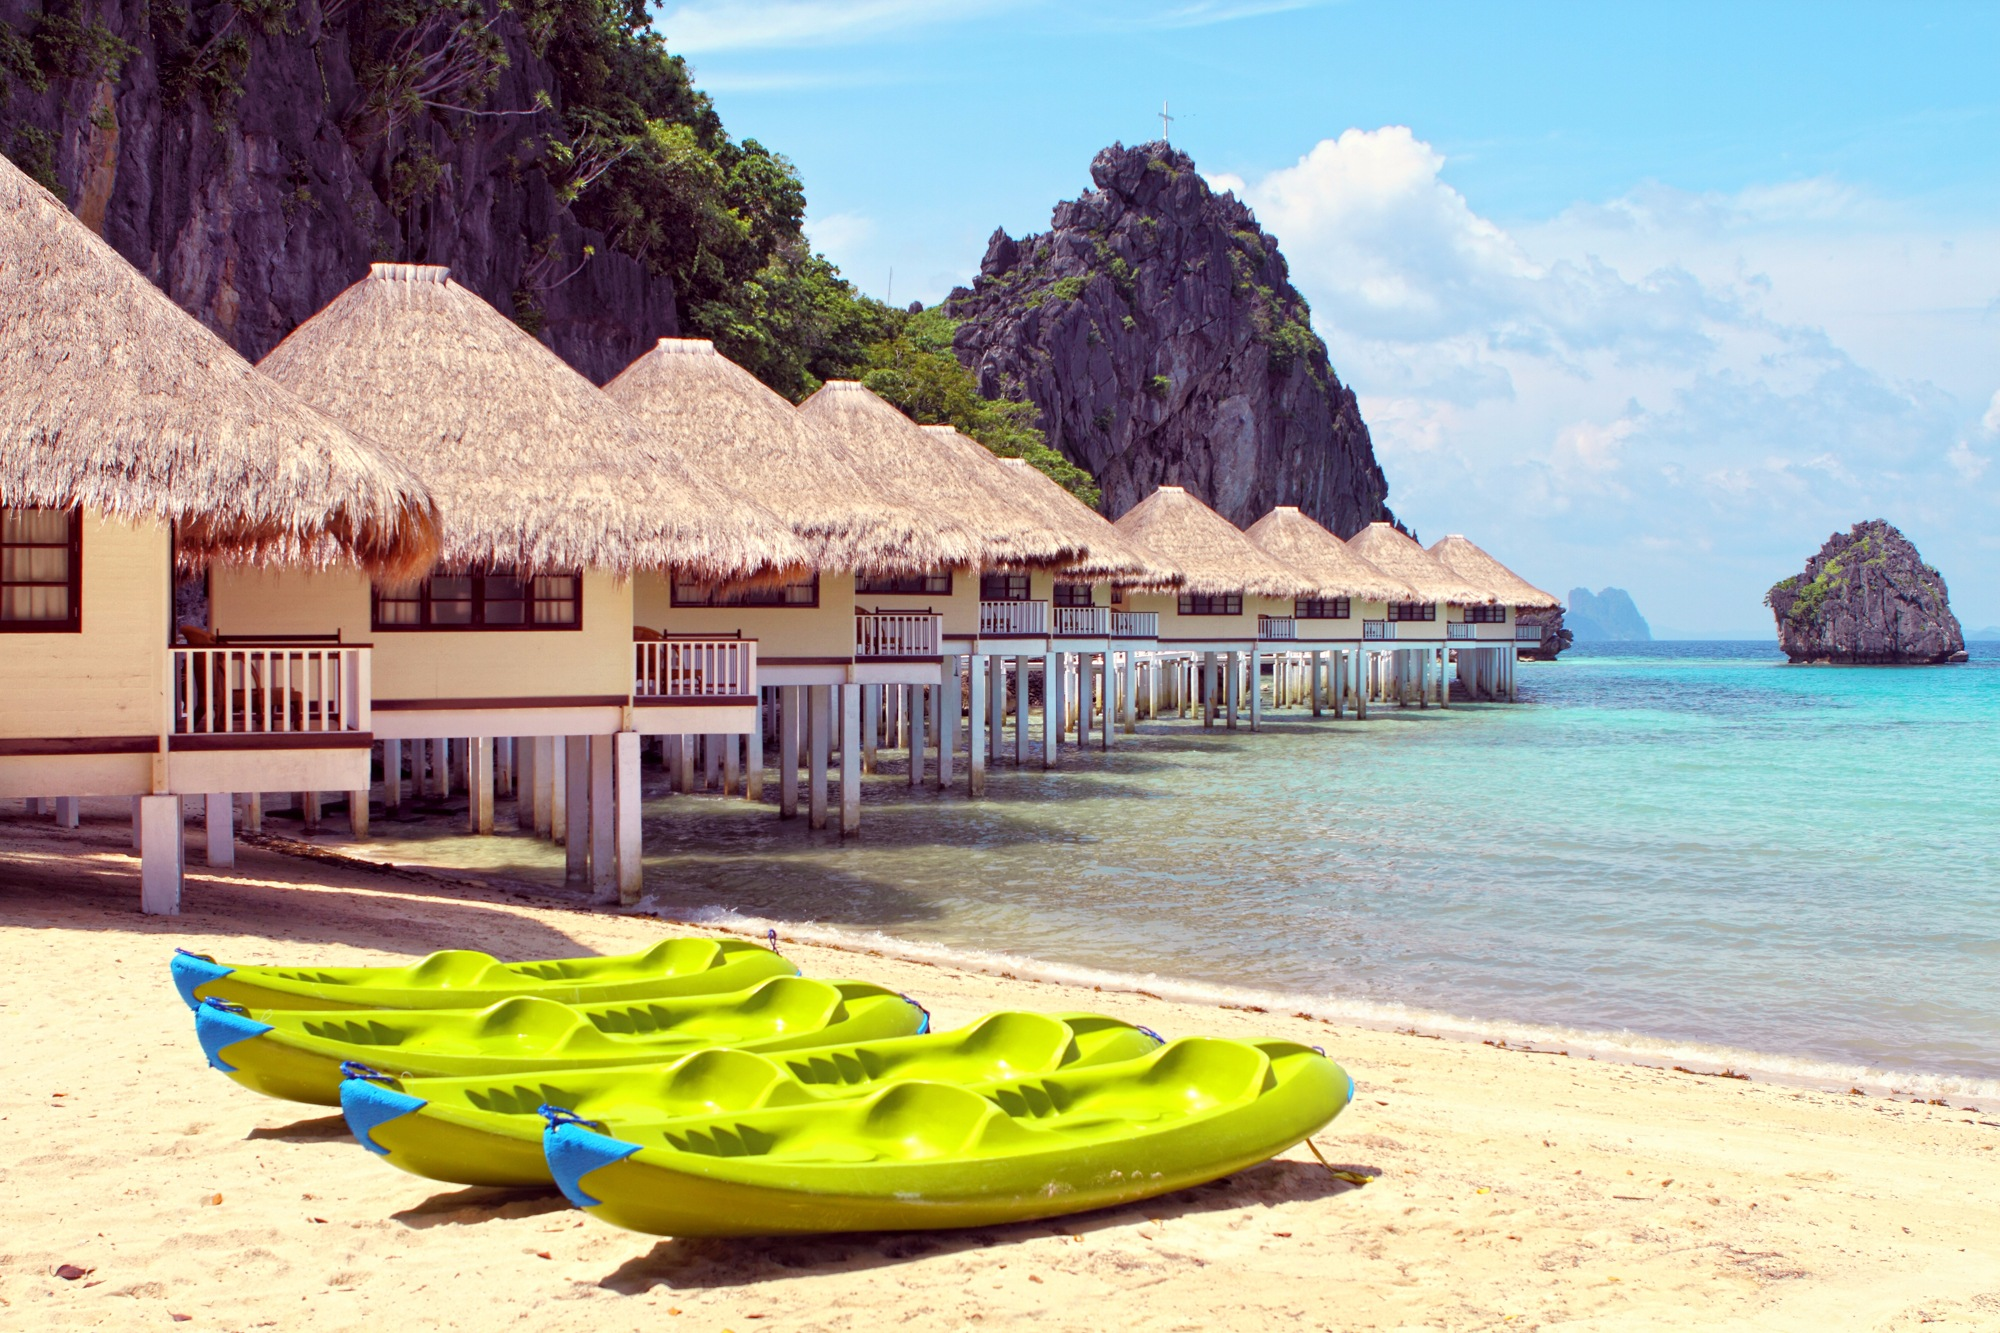 El Nido Resort – Apulit Island – Philippines